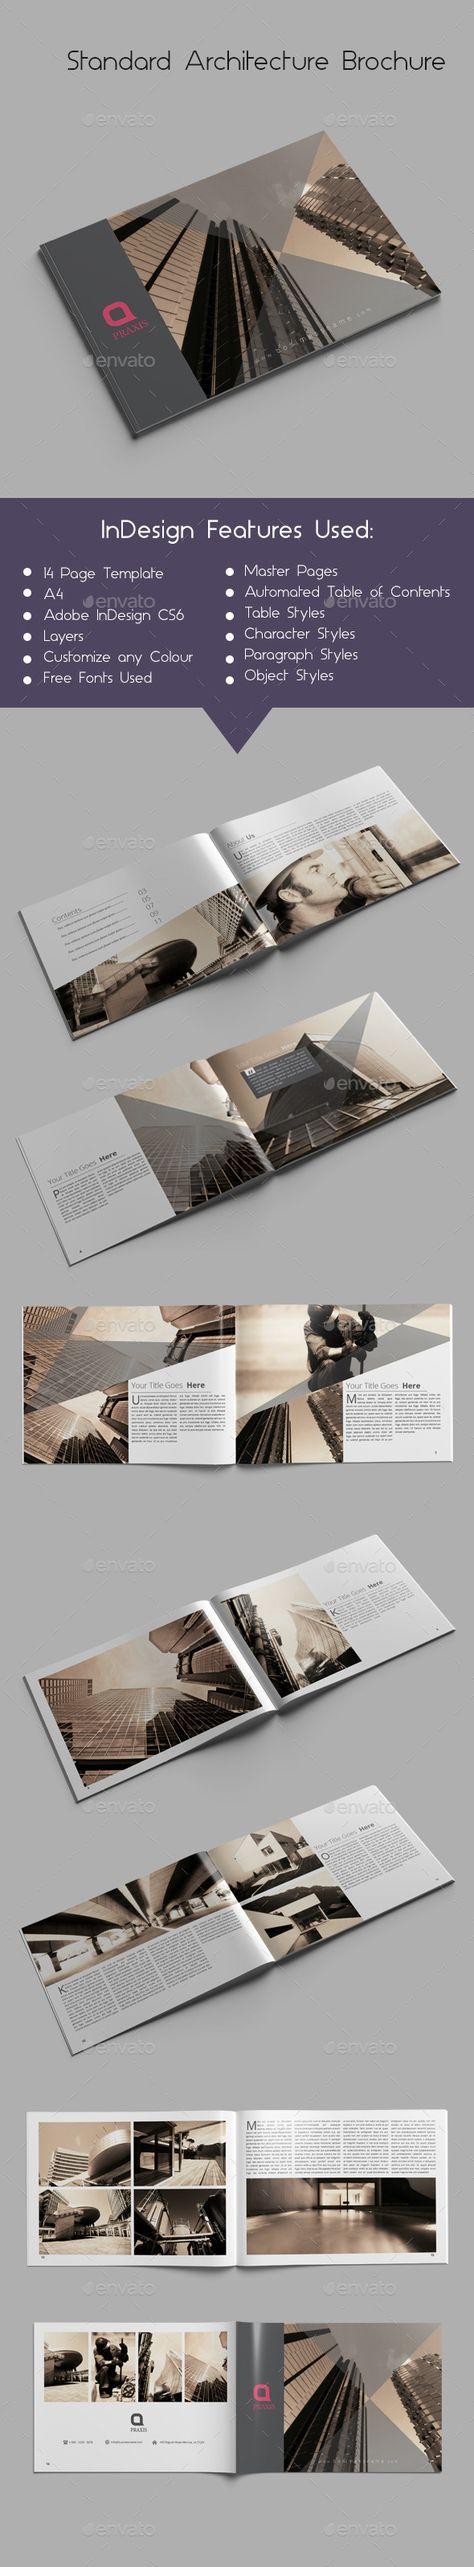 Standard Architecture Brochure Template #design Download: http://graphicriver.net/item/standard-architecture-brochure/9852707?ref=ksioks